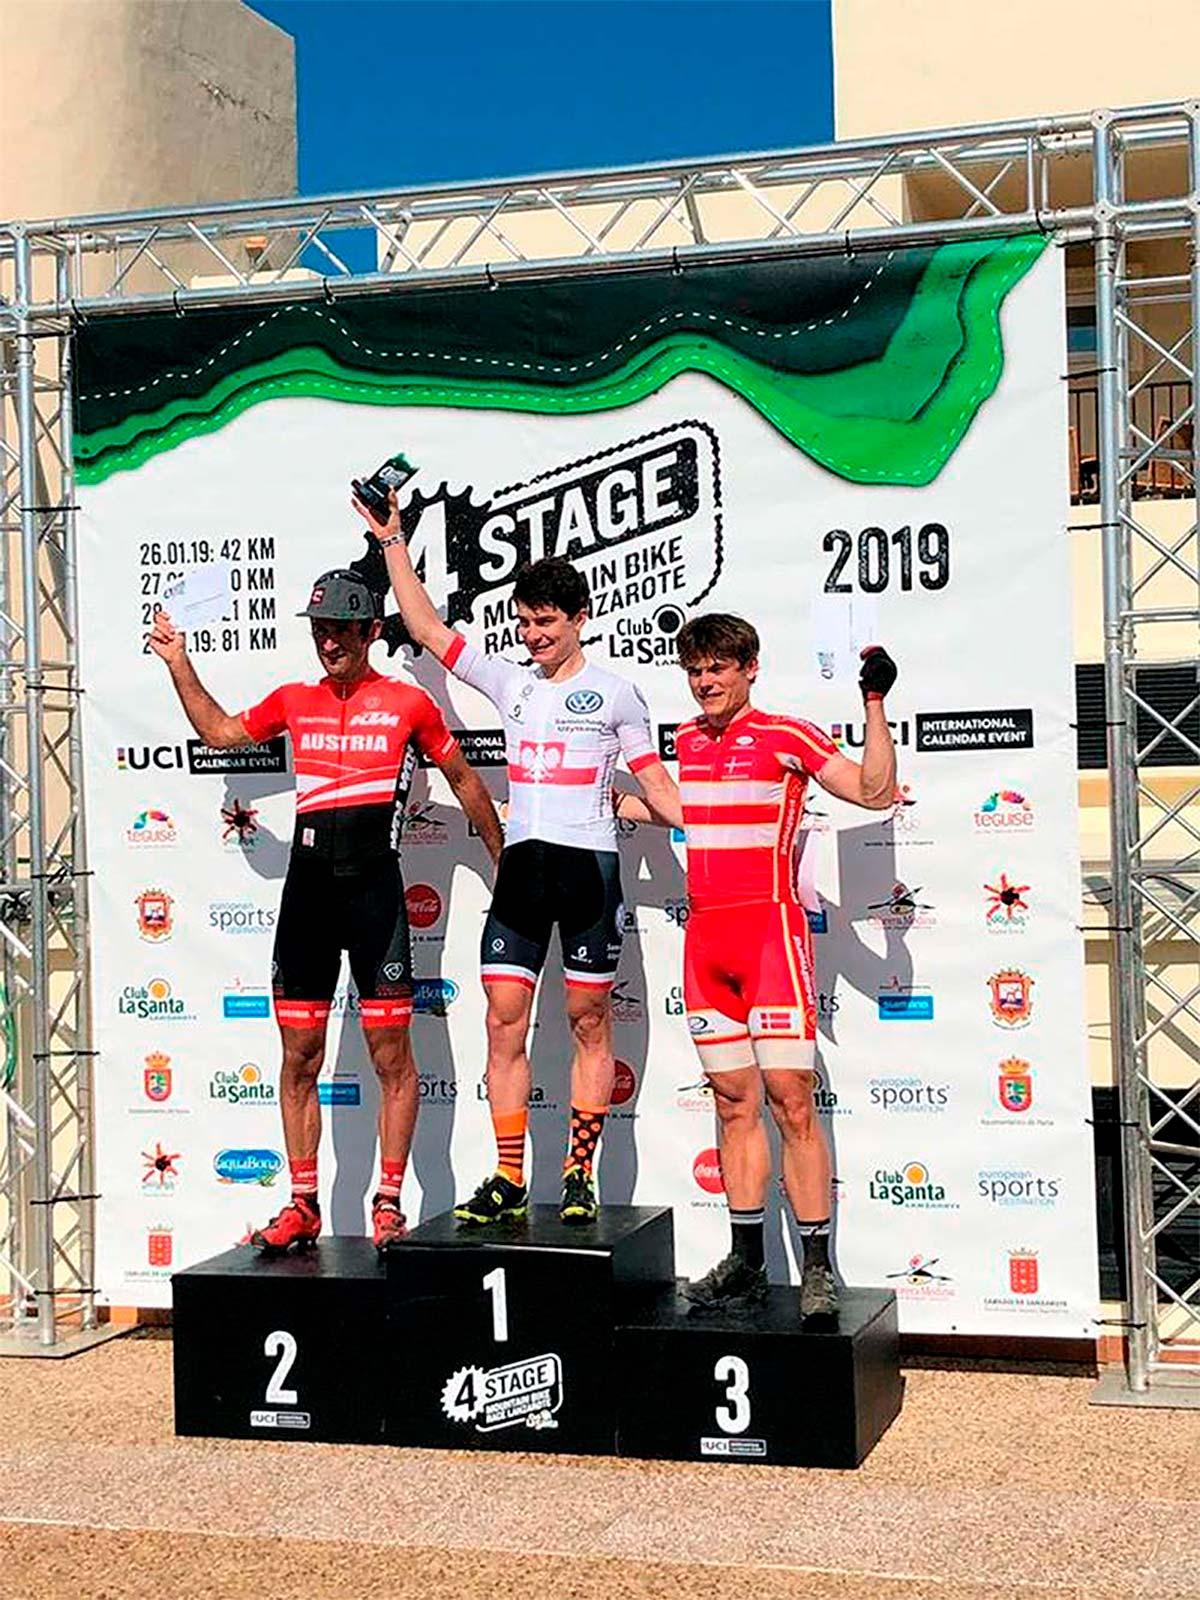 4 Stage MTB Race Lanzarote 2019: Bartlomiej Wawak y Blaza Pintaric repiten victoria en la segunda etapa